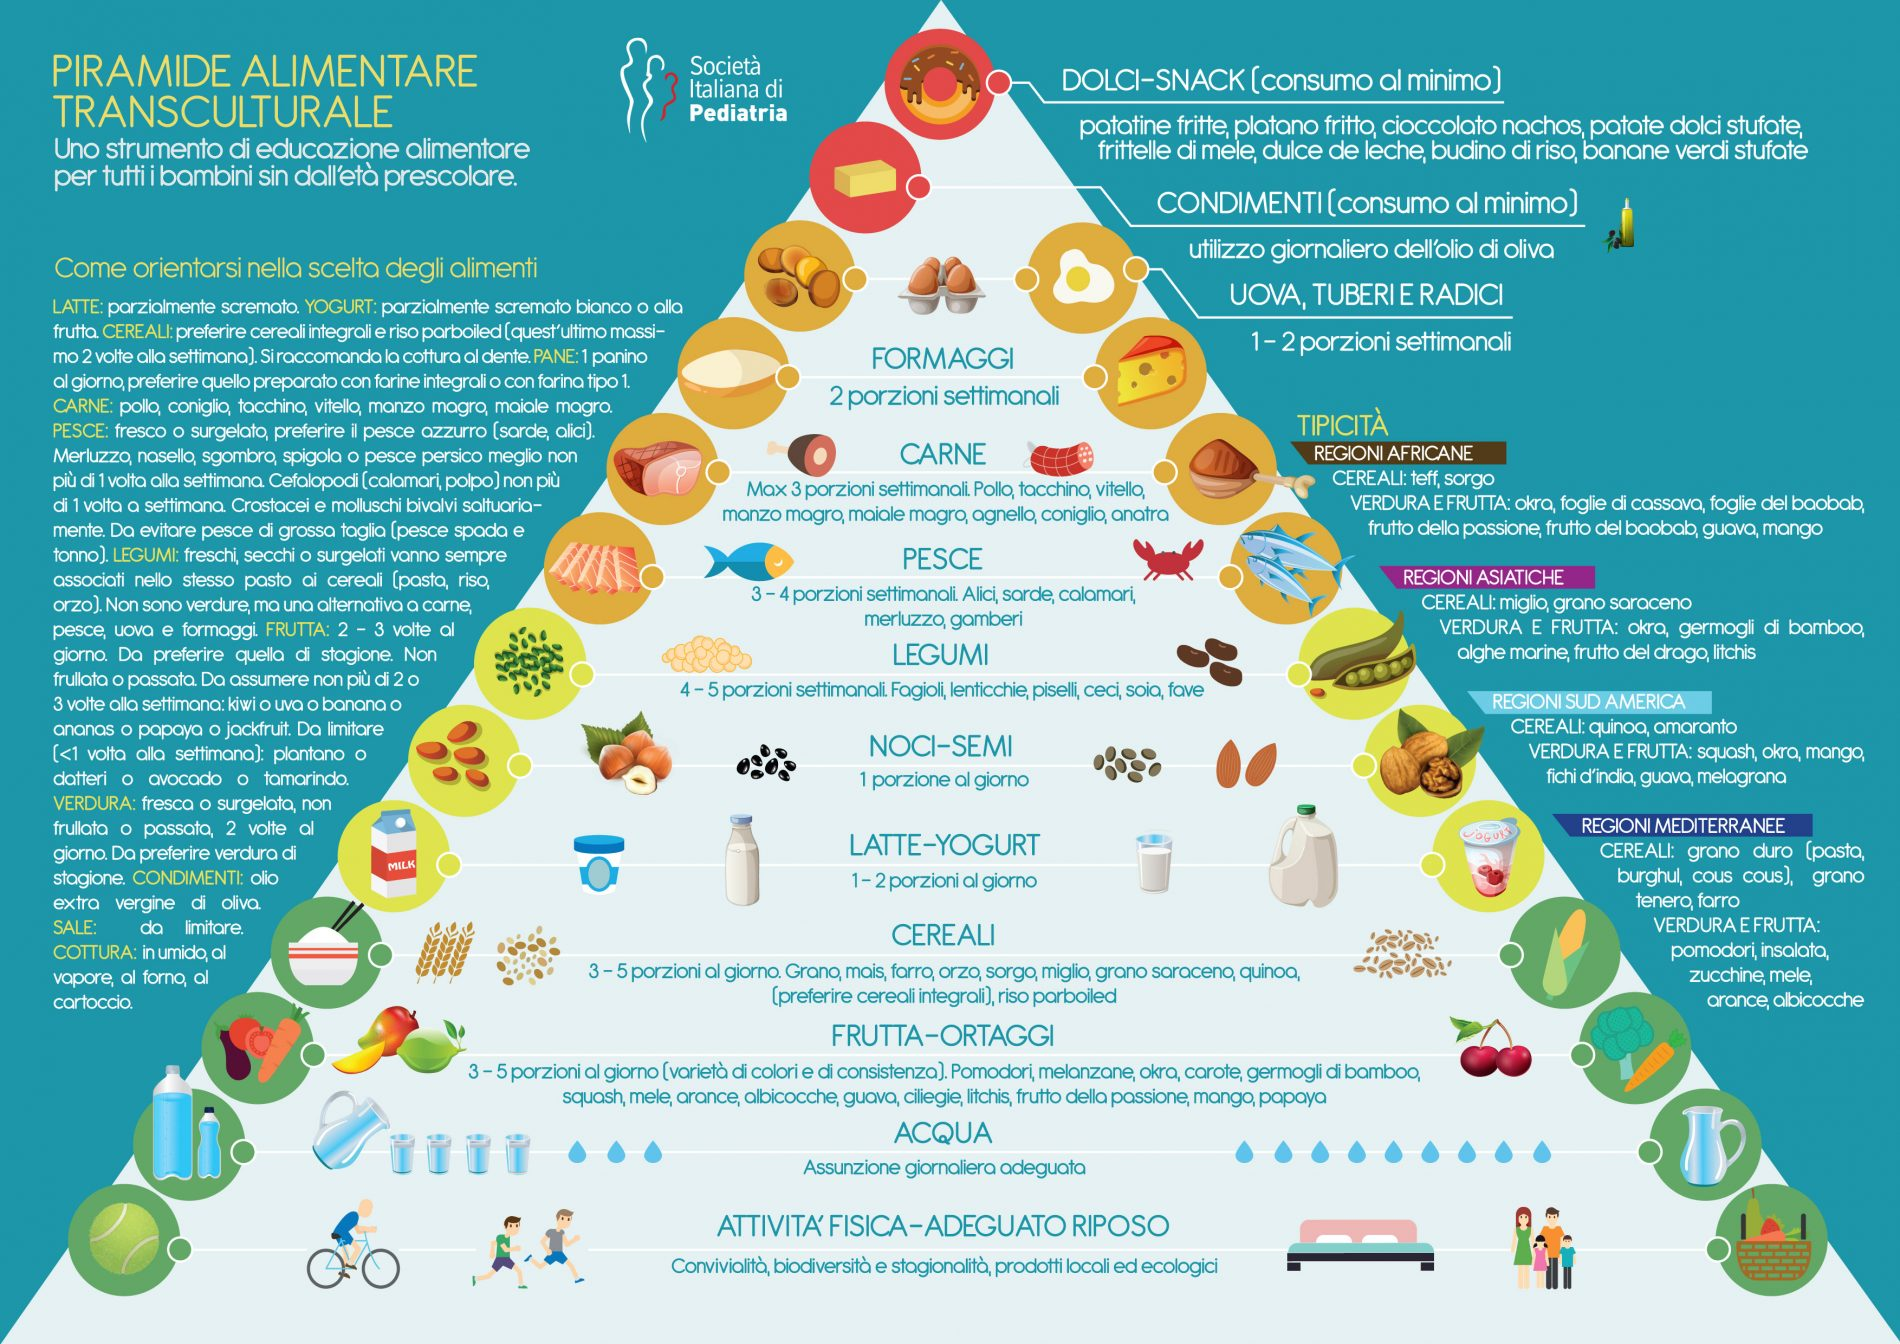 SIP piramide alimentare transculturale